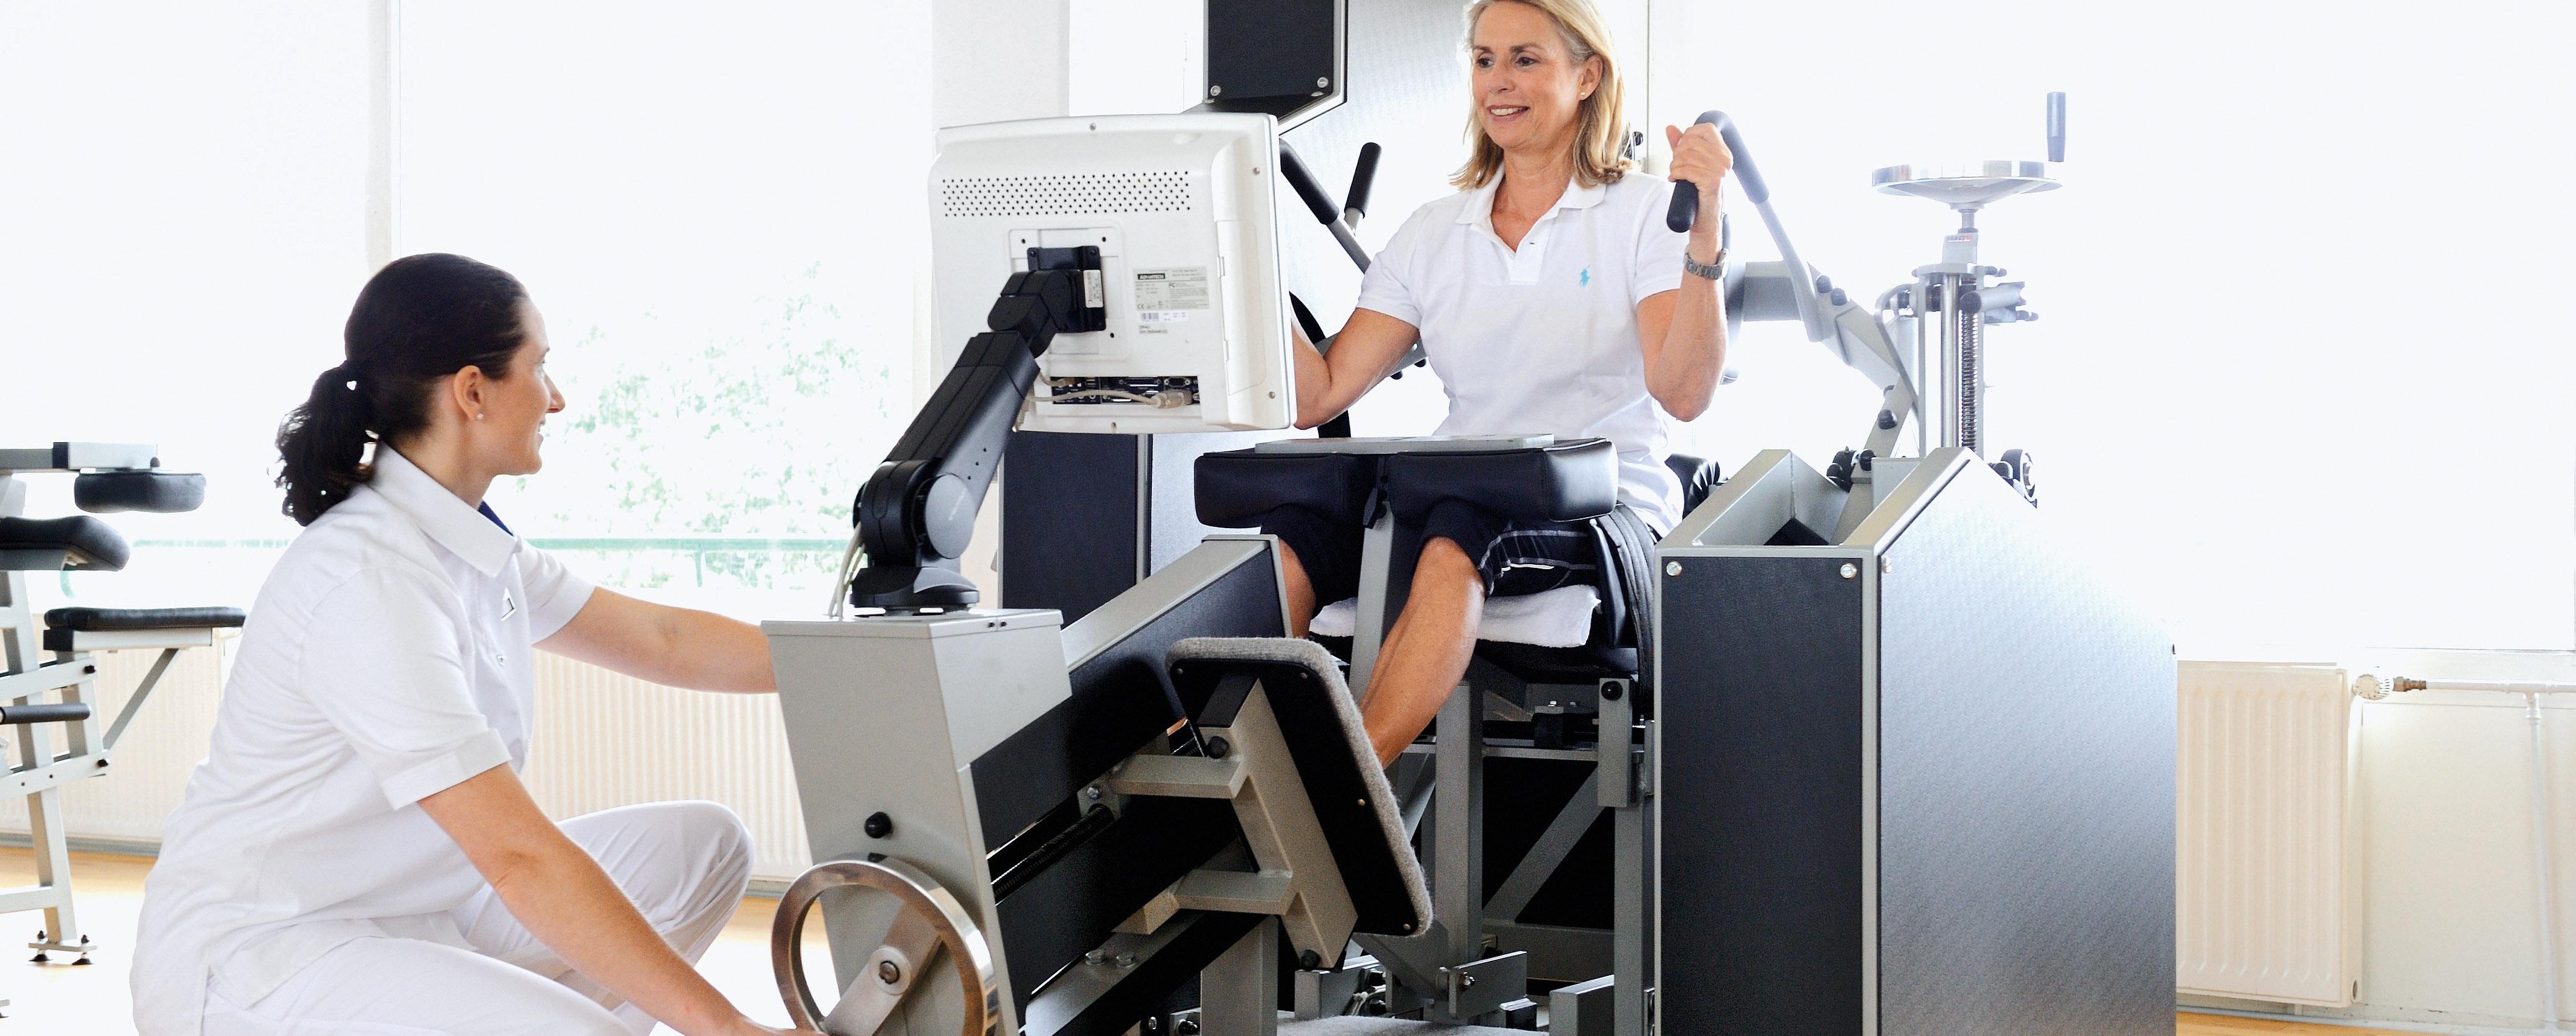 Kieser Training: Fitness-Sieger bei Stiftung Warentest